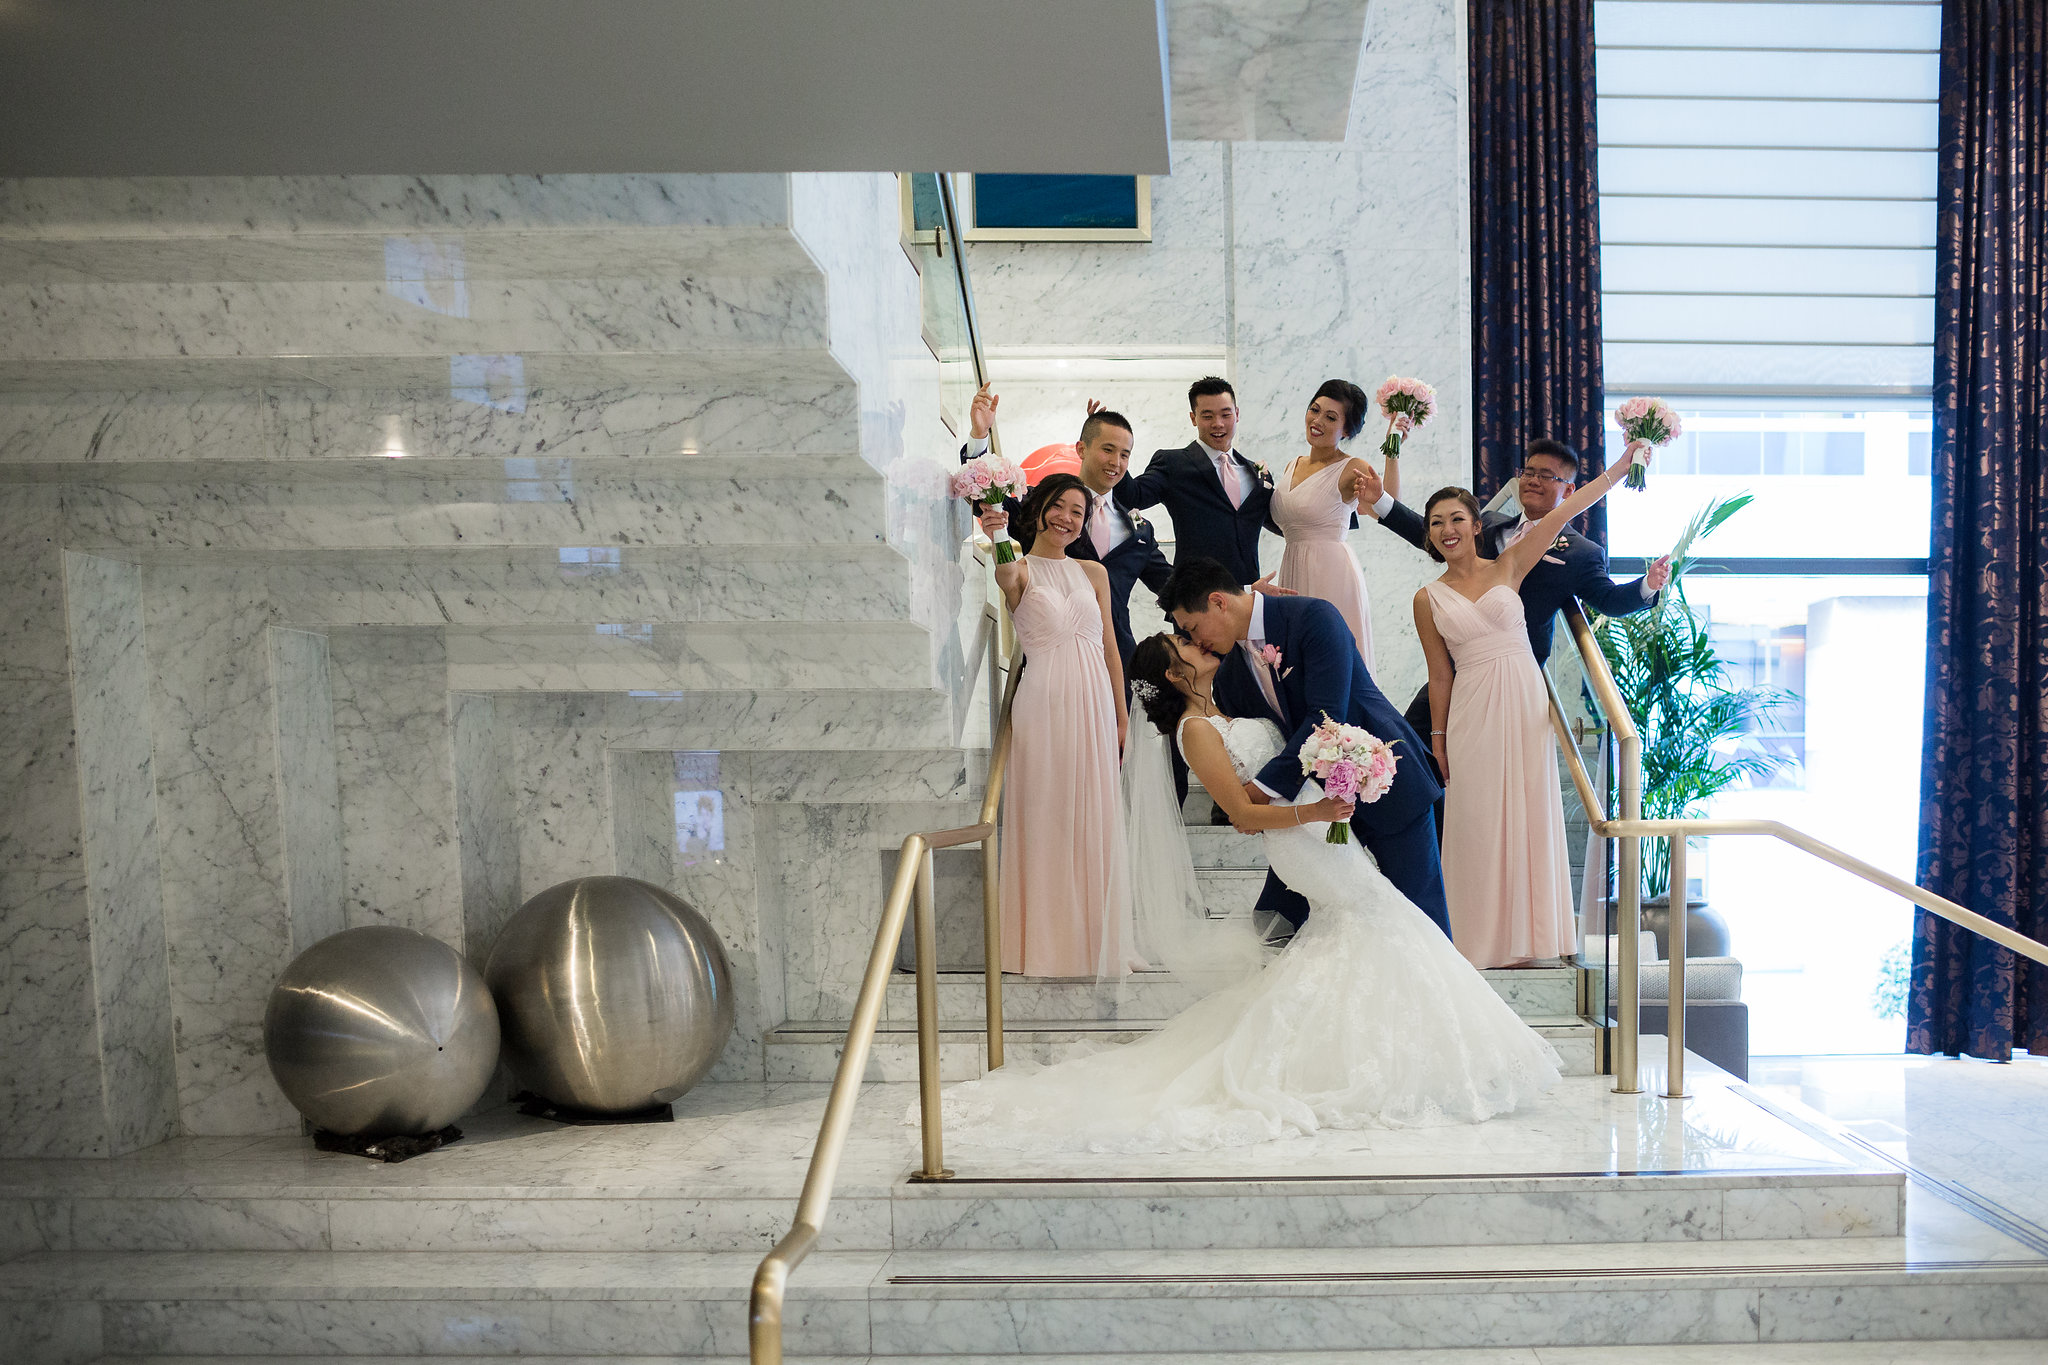 hotel Nikko San Francisco wedding photography-11.jpg